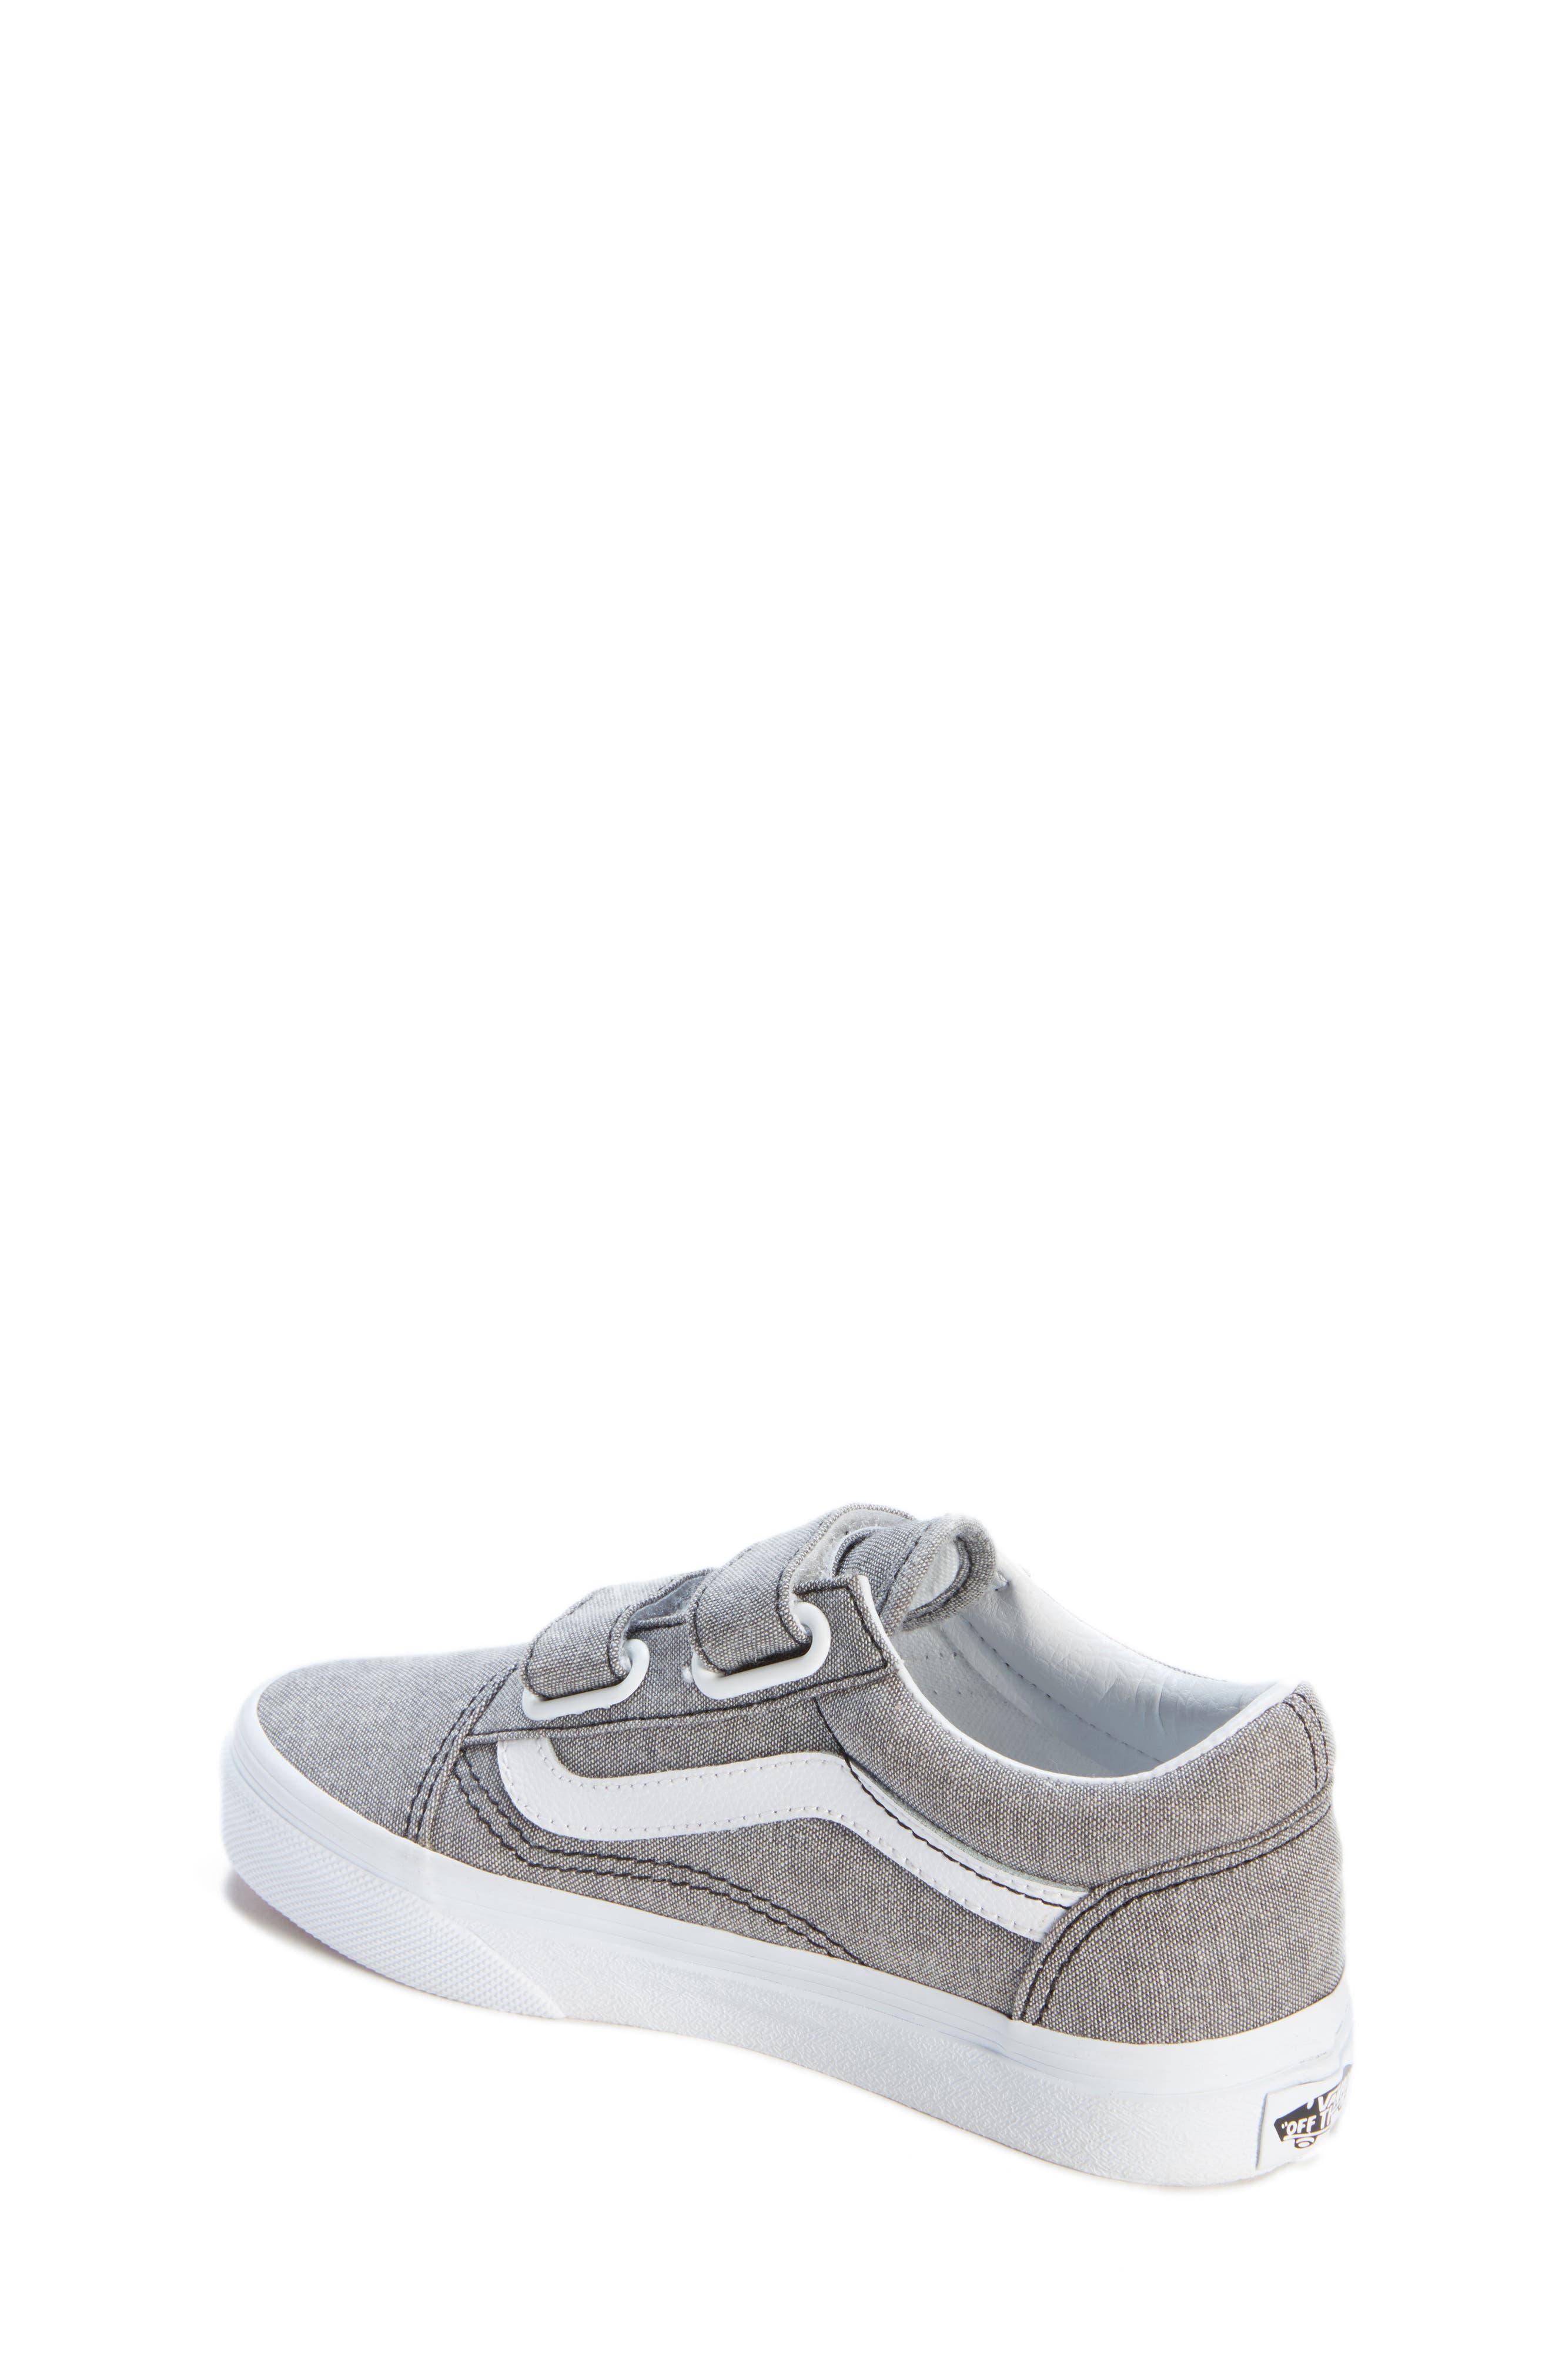 'Old Skool' Sneaker,                             Alternate thumbnail 2, color,                             OXFORD GRAY TRUE WHITE